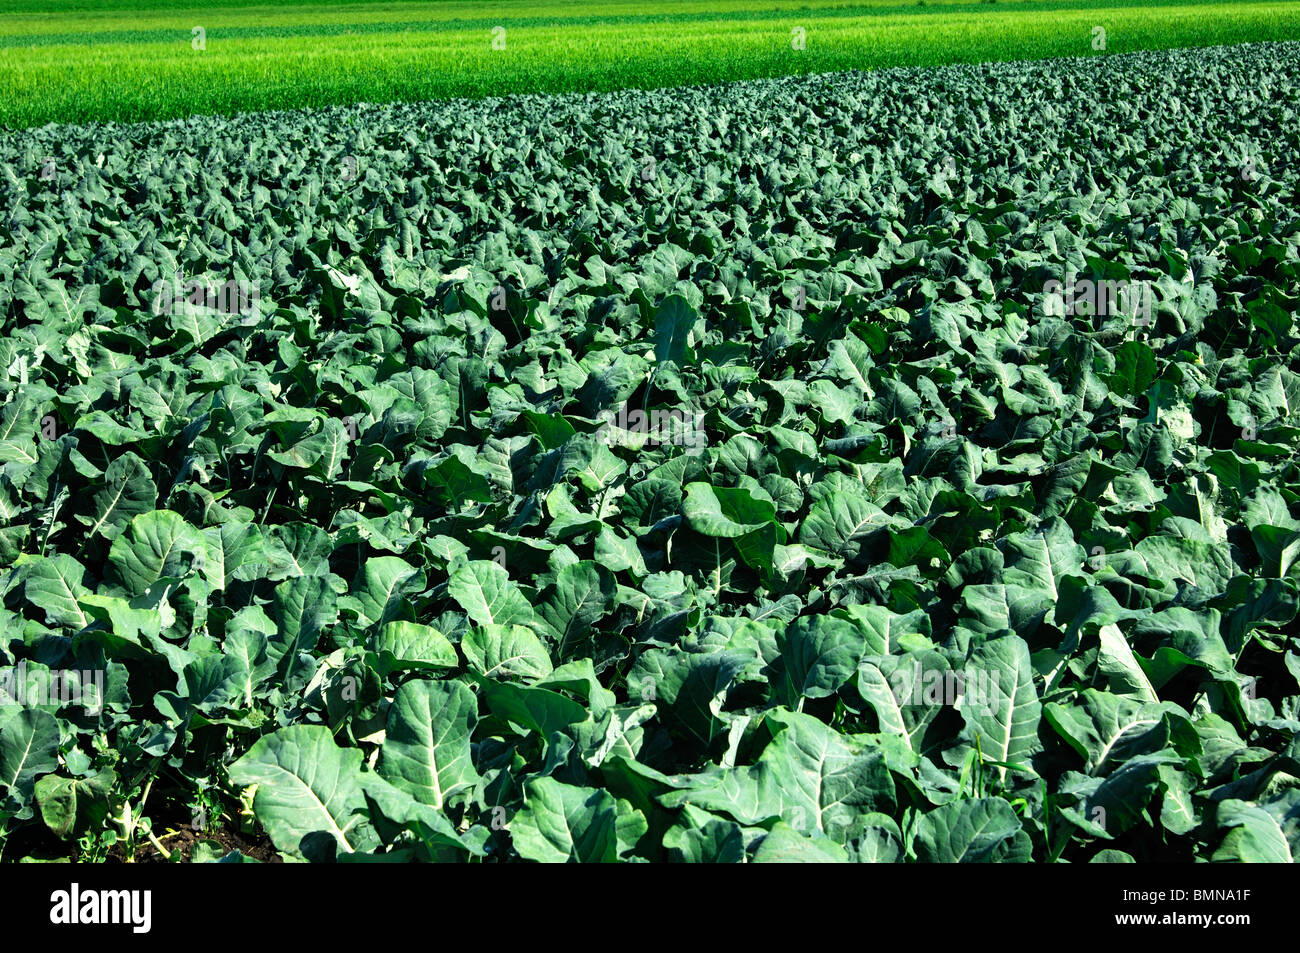 broccoli field stockfotos broccoli field bilder alamy. Black Bedroom Furniture Sets. Home Design Ideas